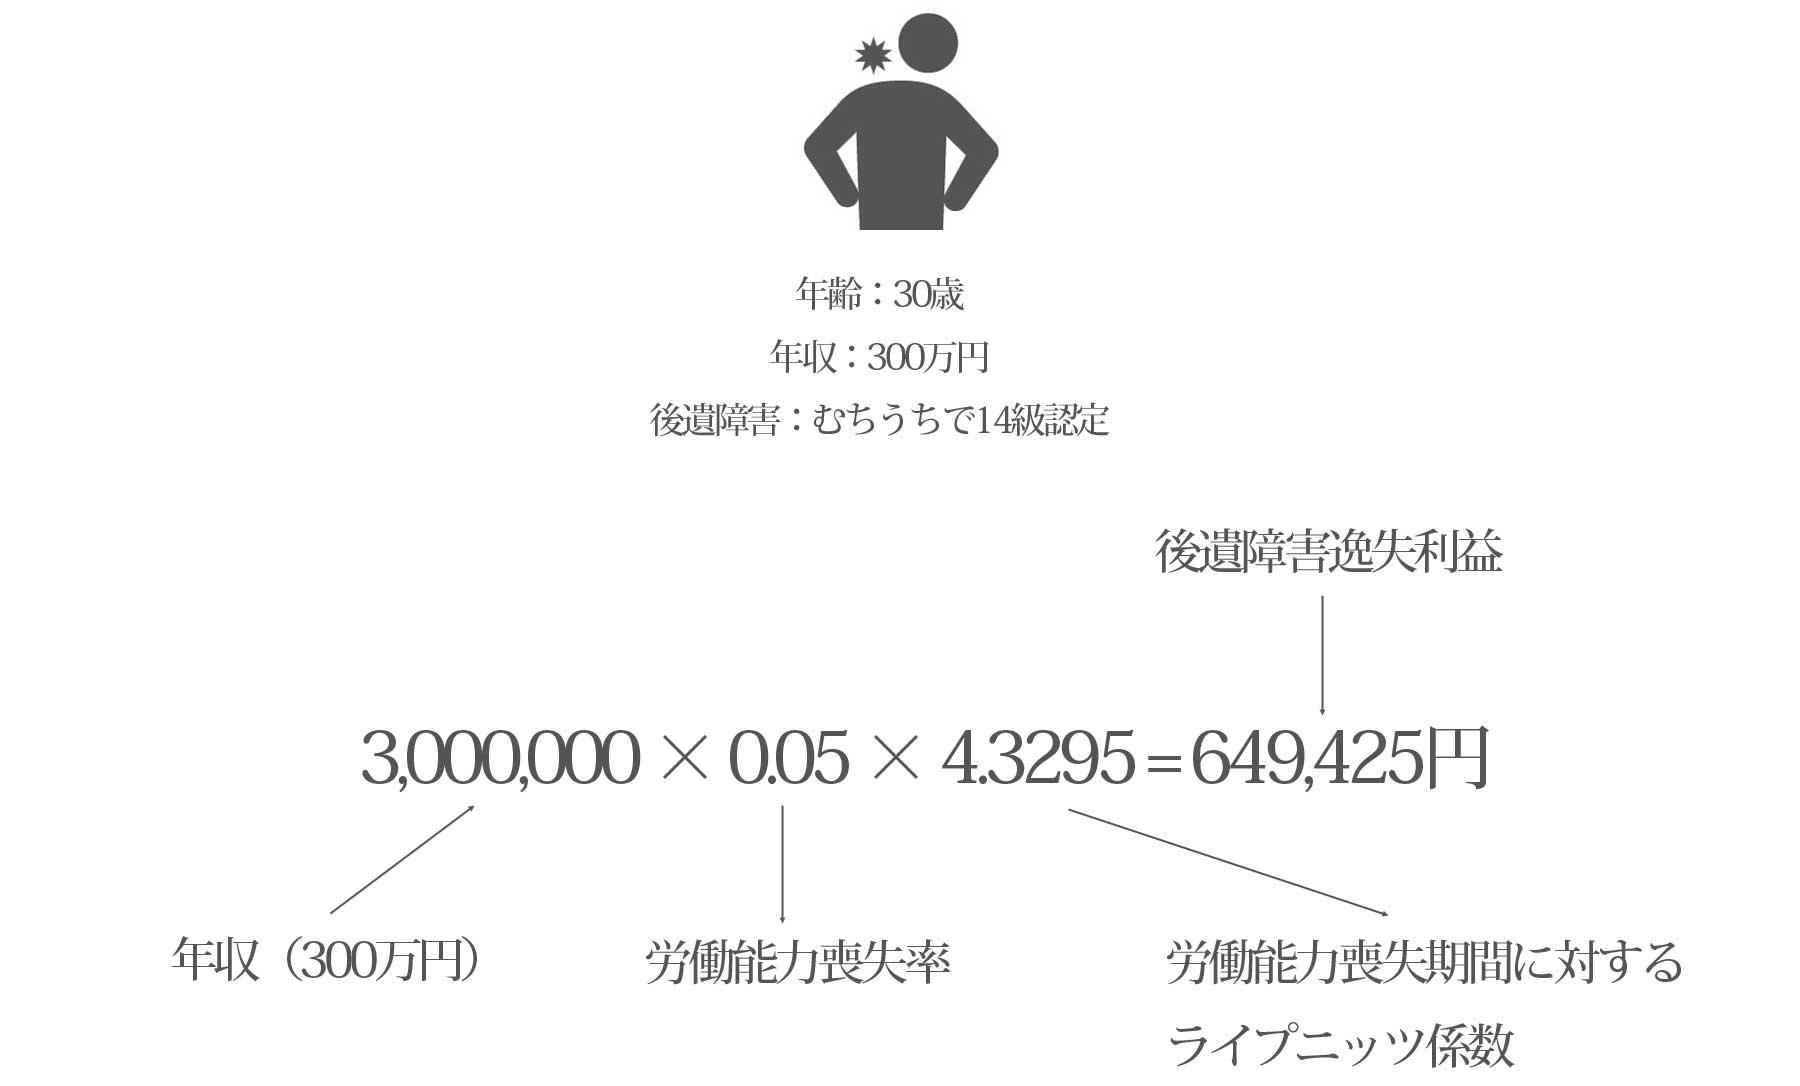 逸失利益の計算式